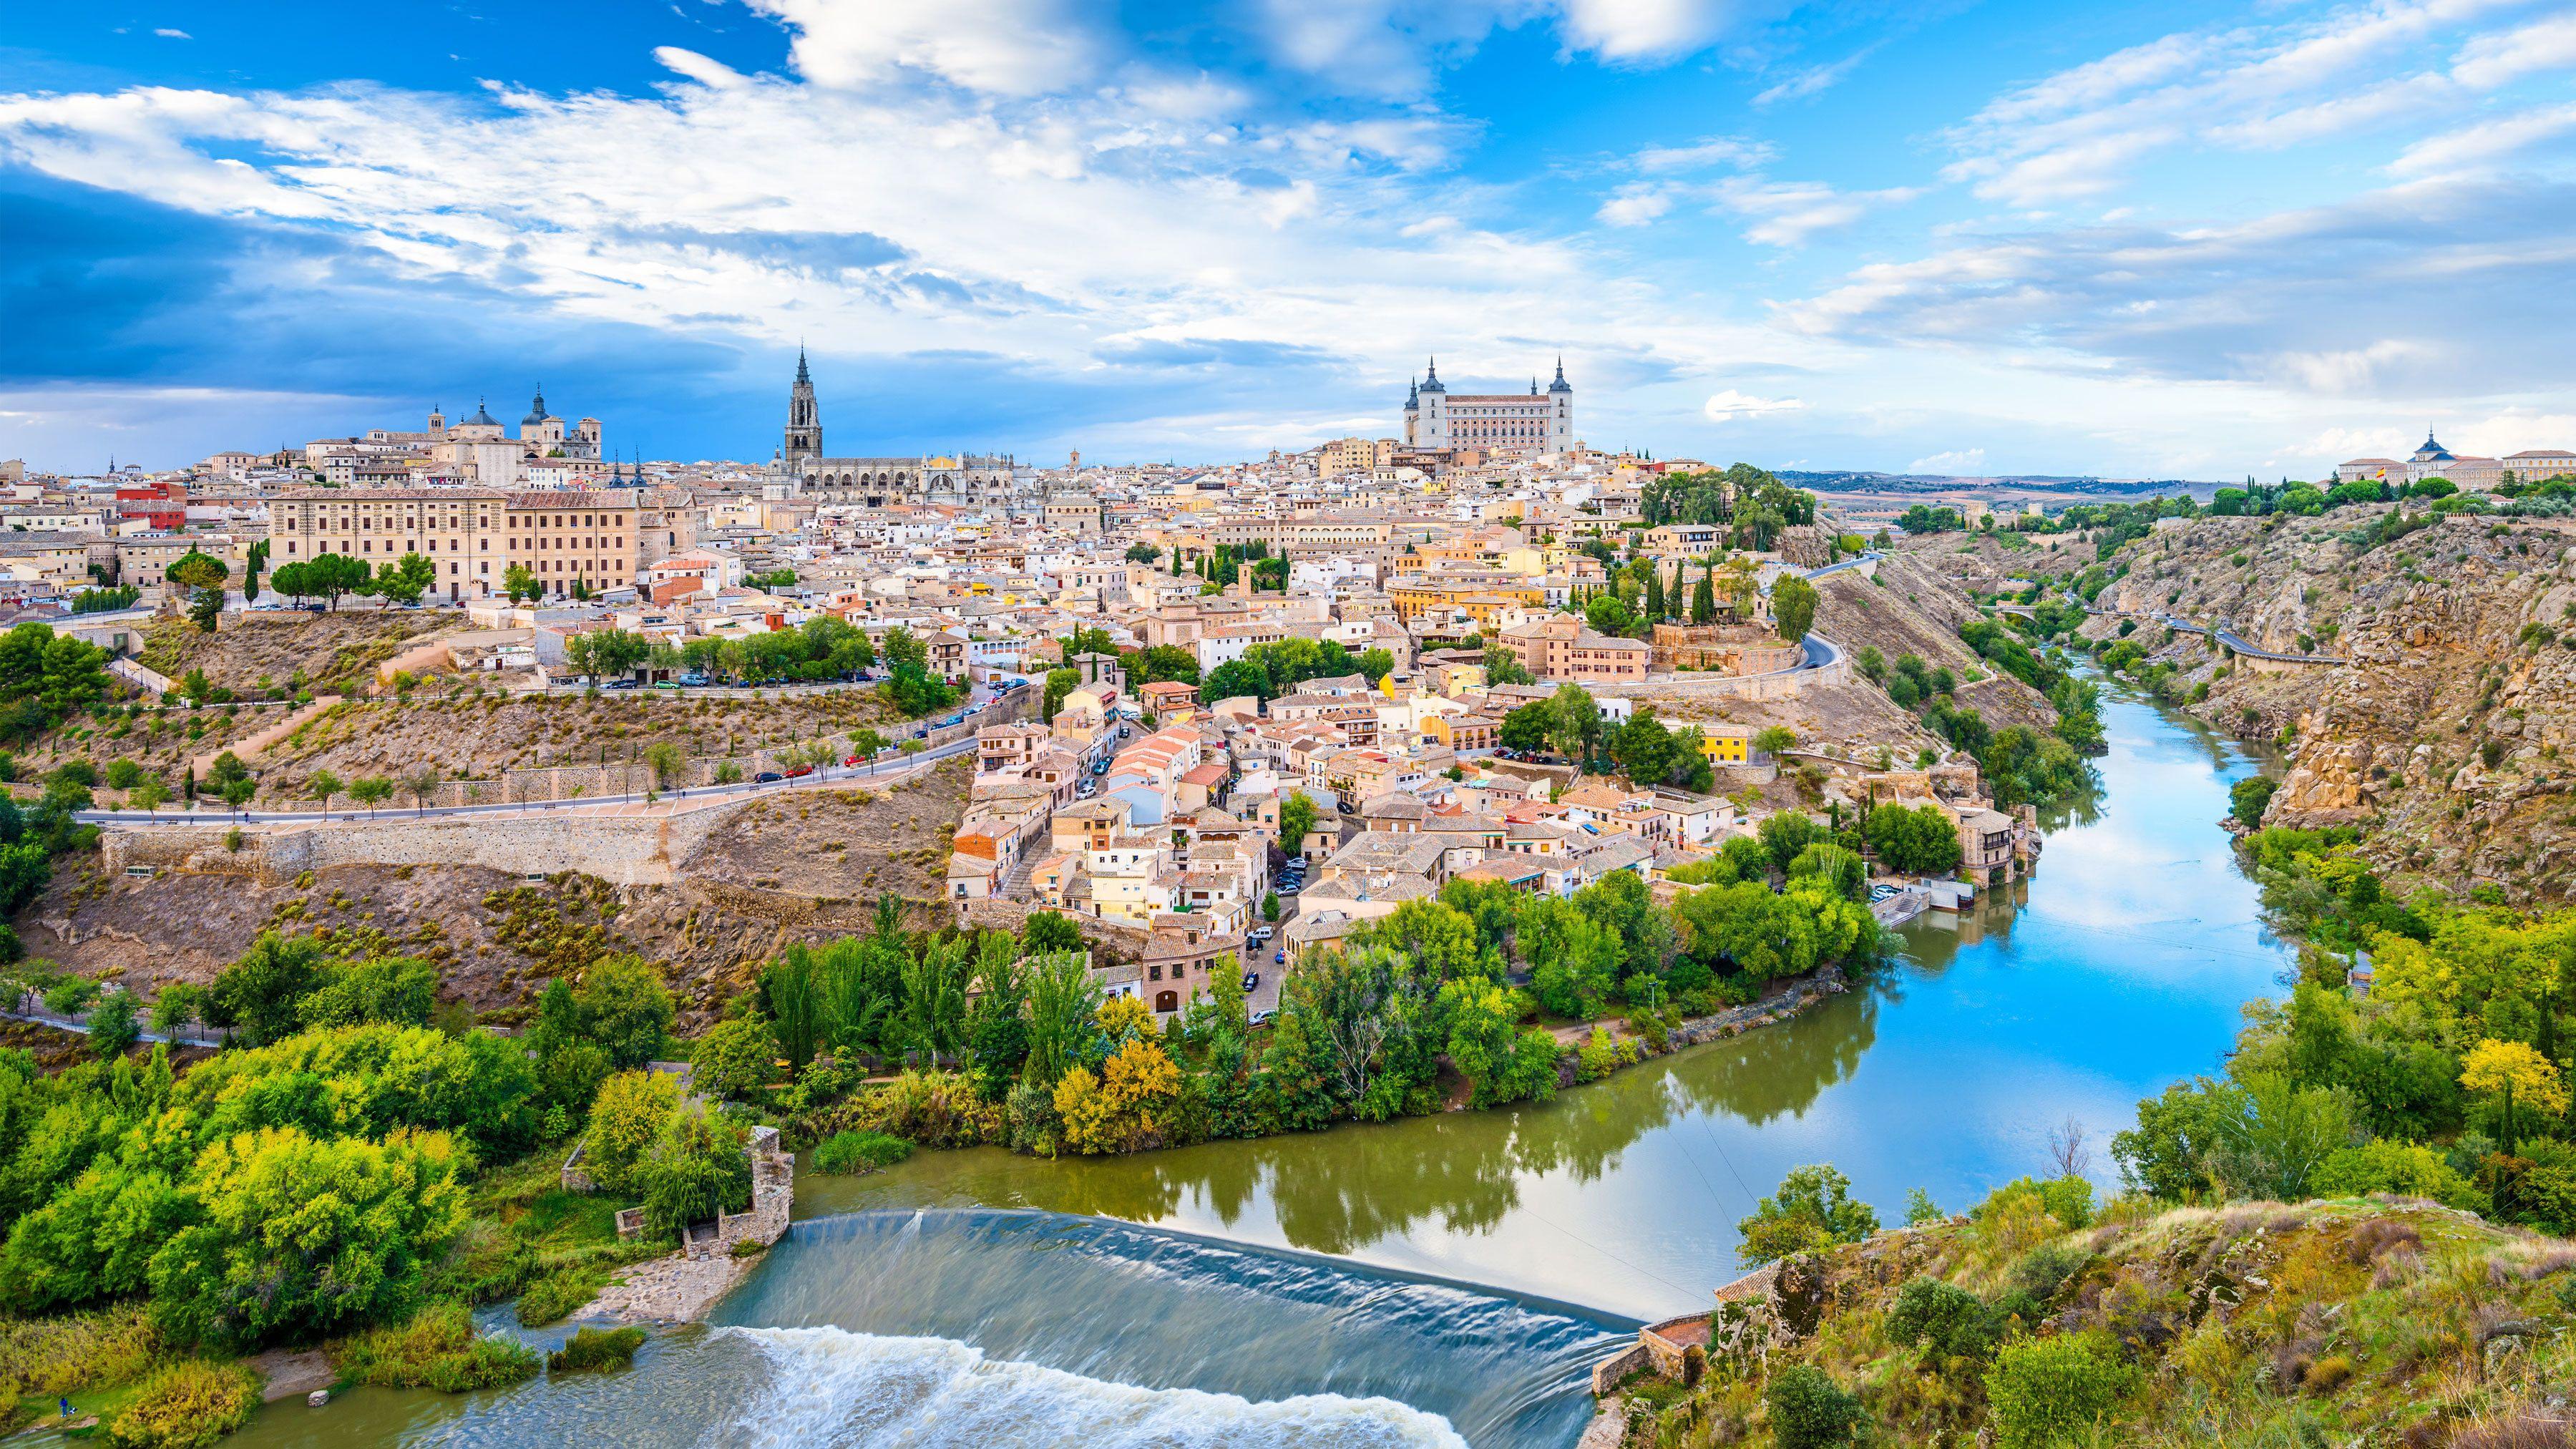 Combo Excursion Package: El Escorial, Valley of the Fallen & Toledo